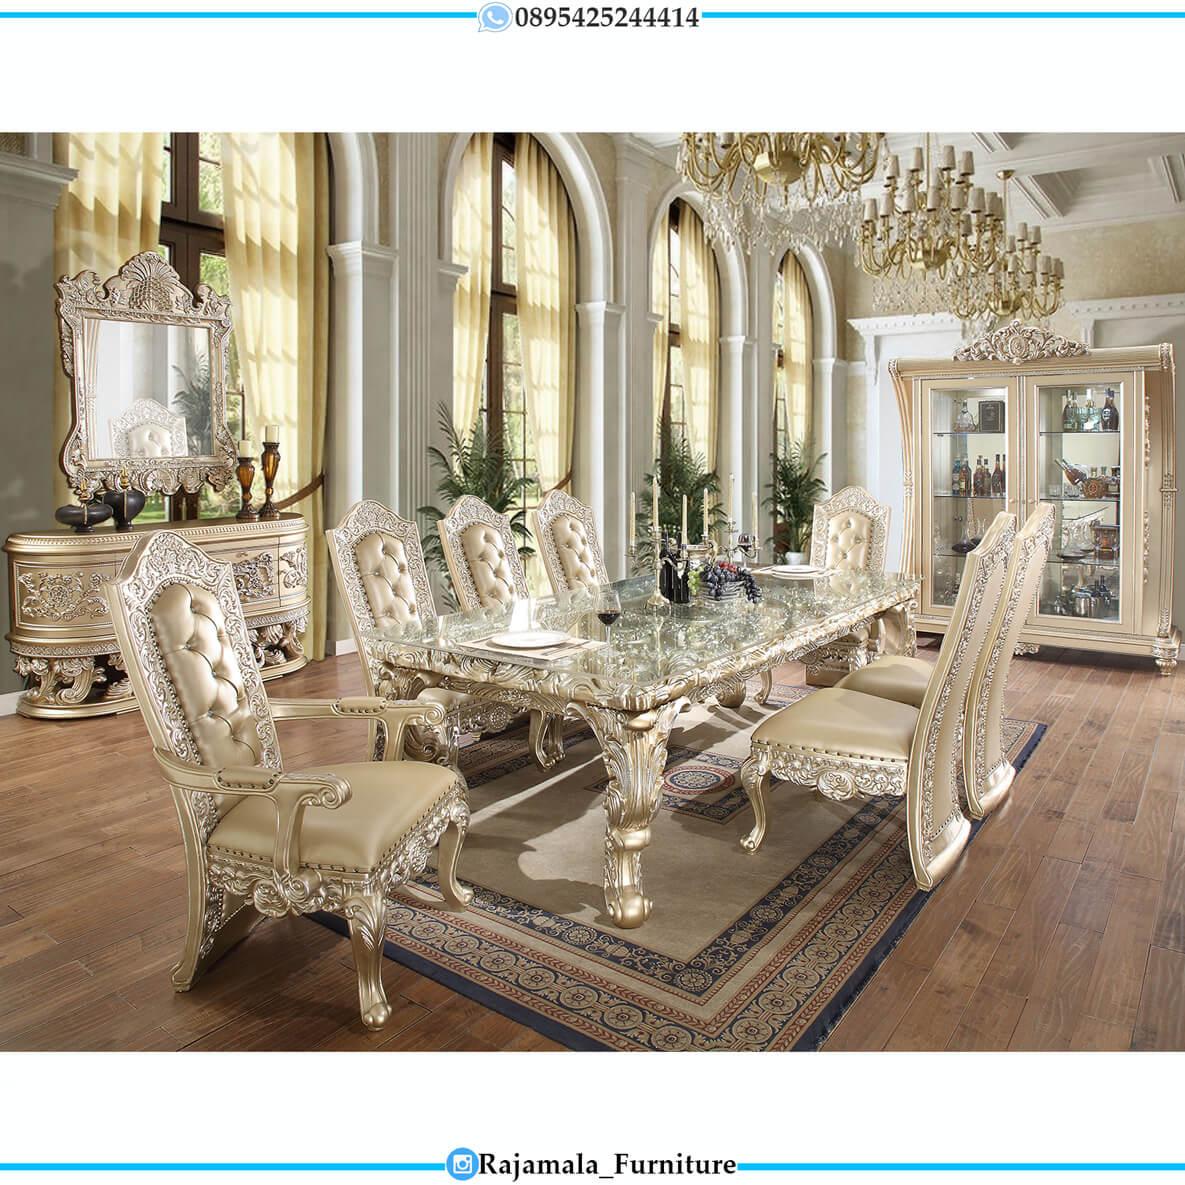 Set Meja Makan Mewah Terbaru Ukiran Jepara Beuty Luxury Design RM-0457